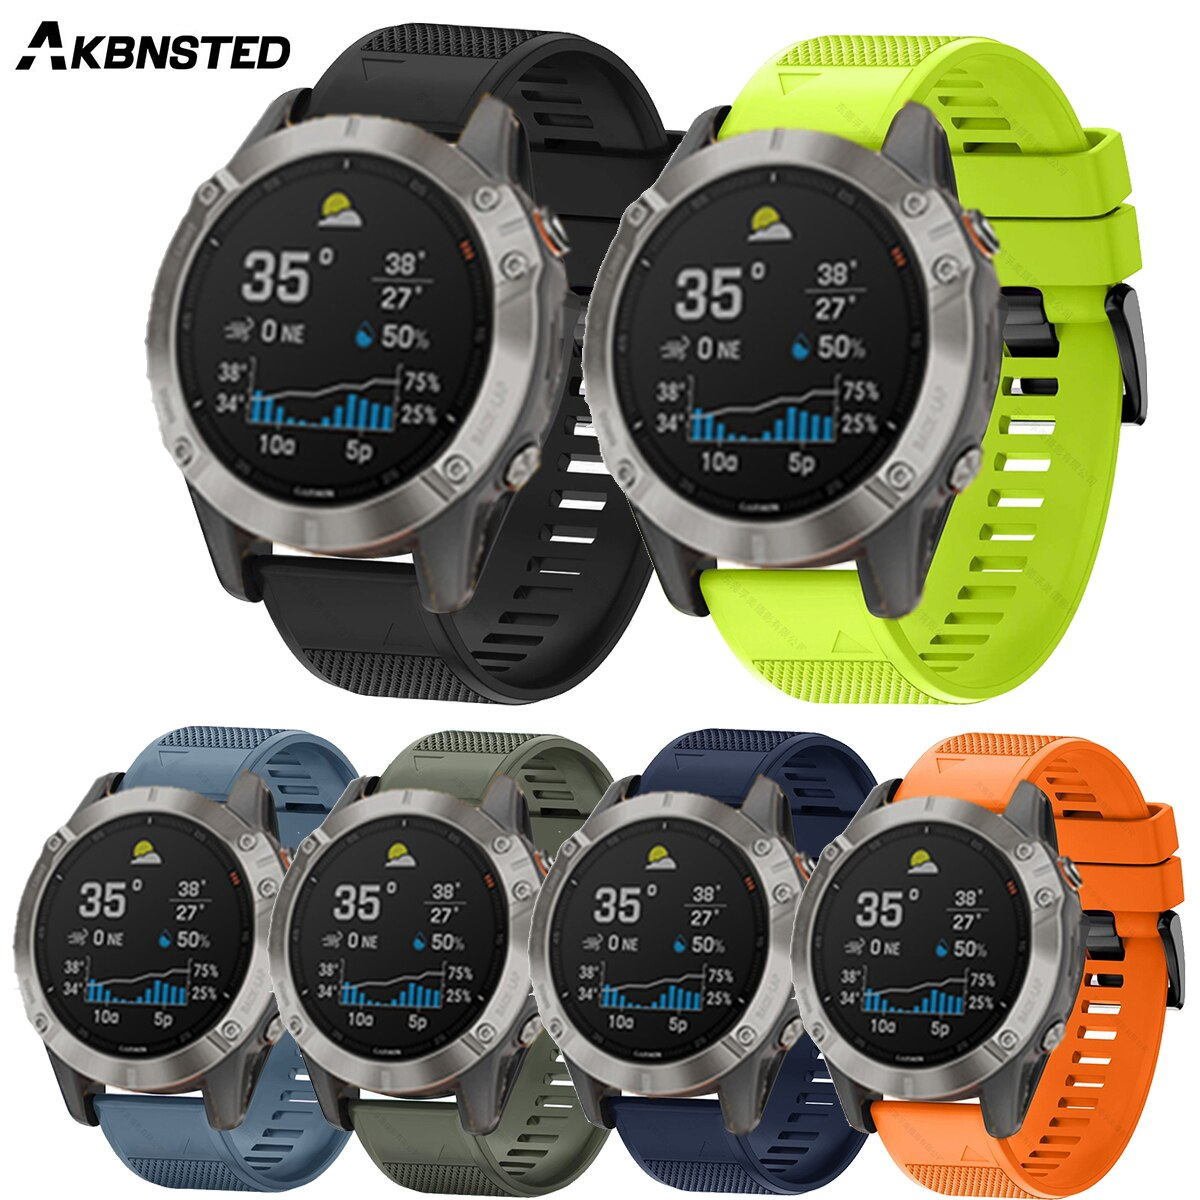 AKBNSTED 20 22 26MM, correa de silicona de liberación rápida para relojes Garmin Fenix 6S Pro Fenix 6 Pro Fenix 5 Fenix5S Fenix 3 Forerunner945